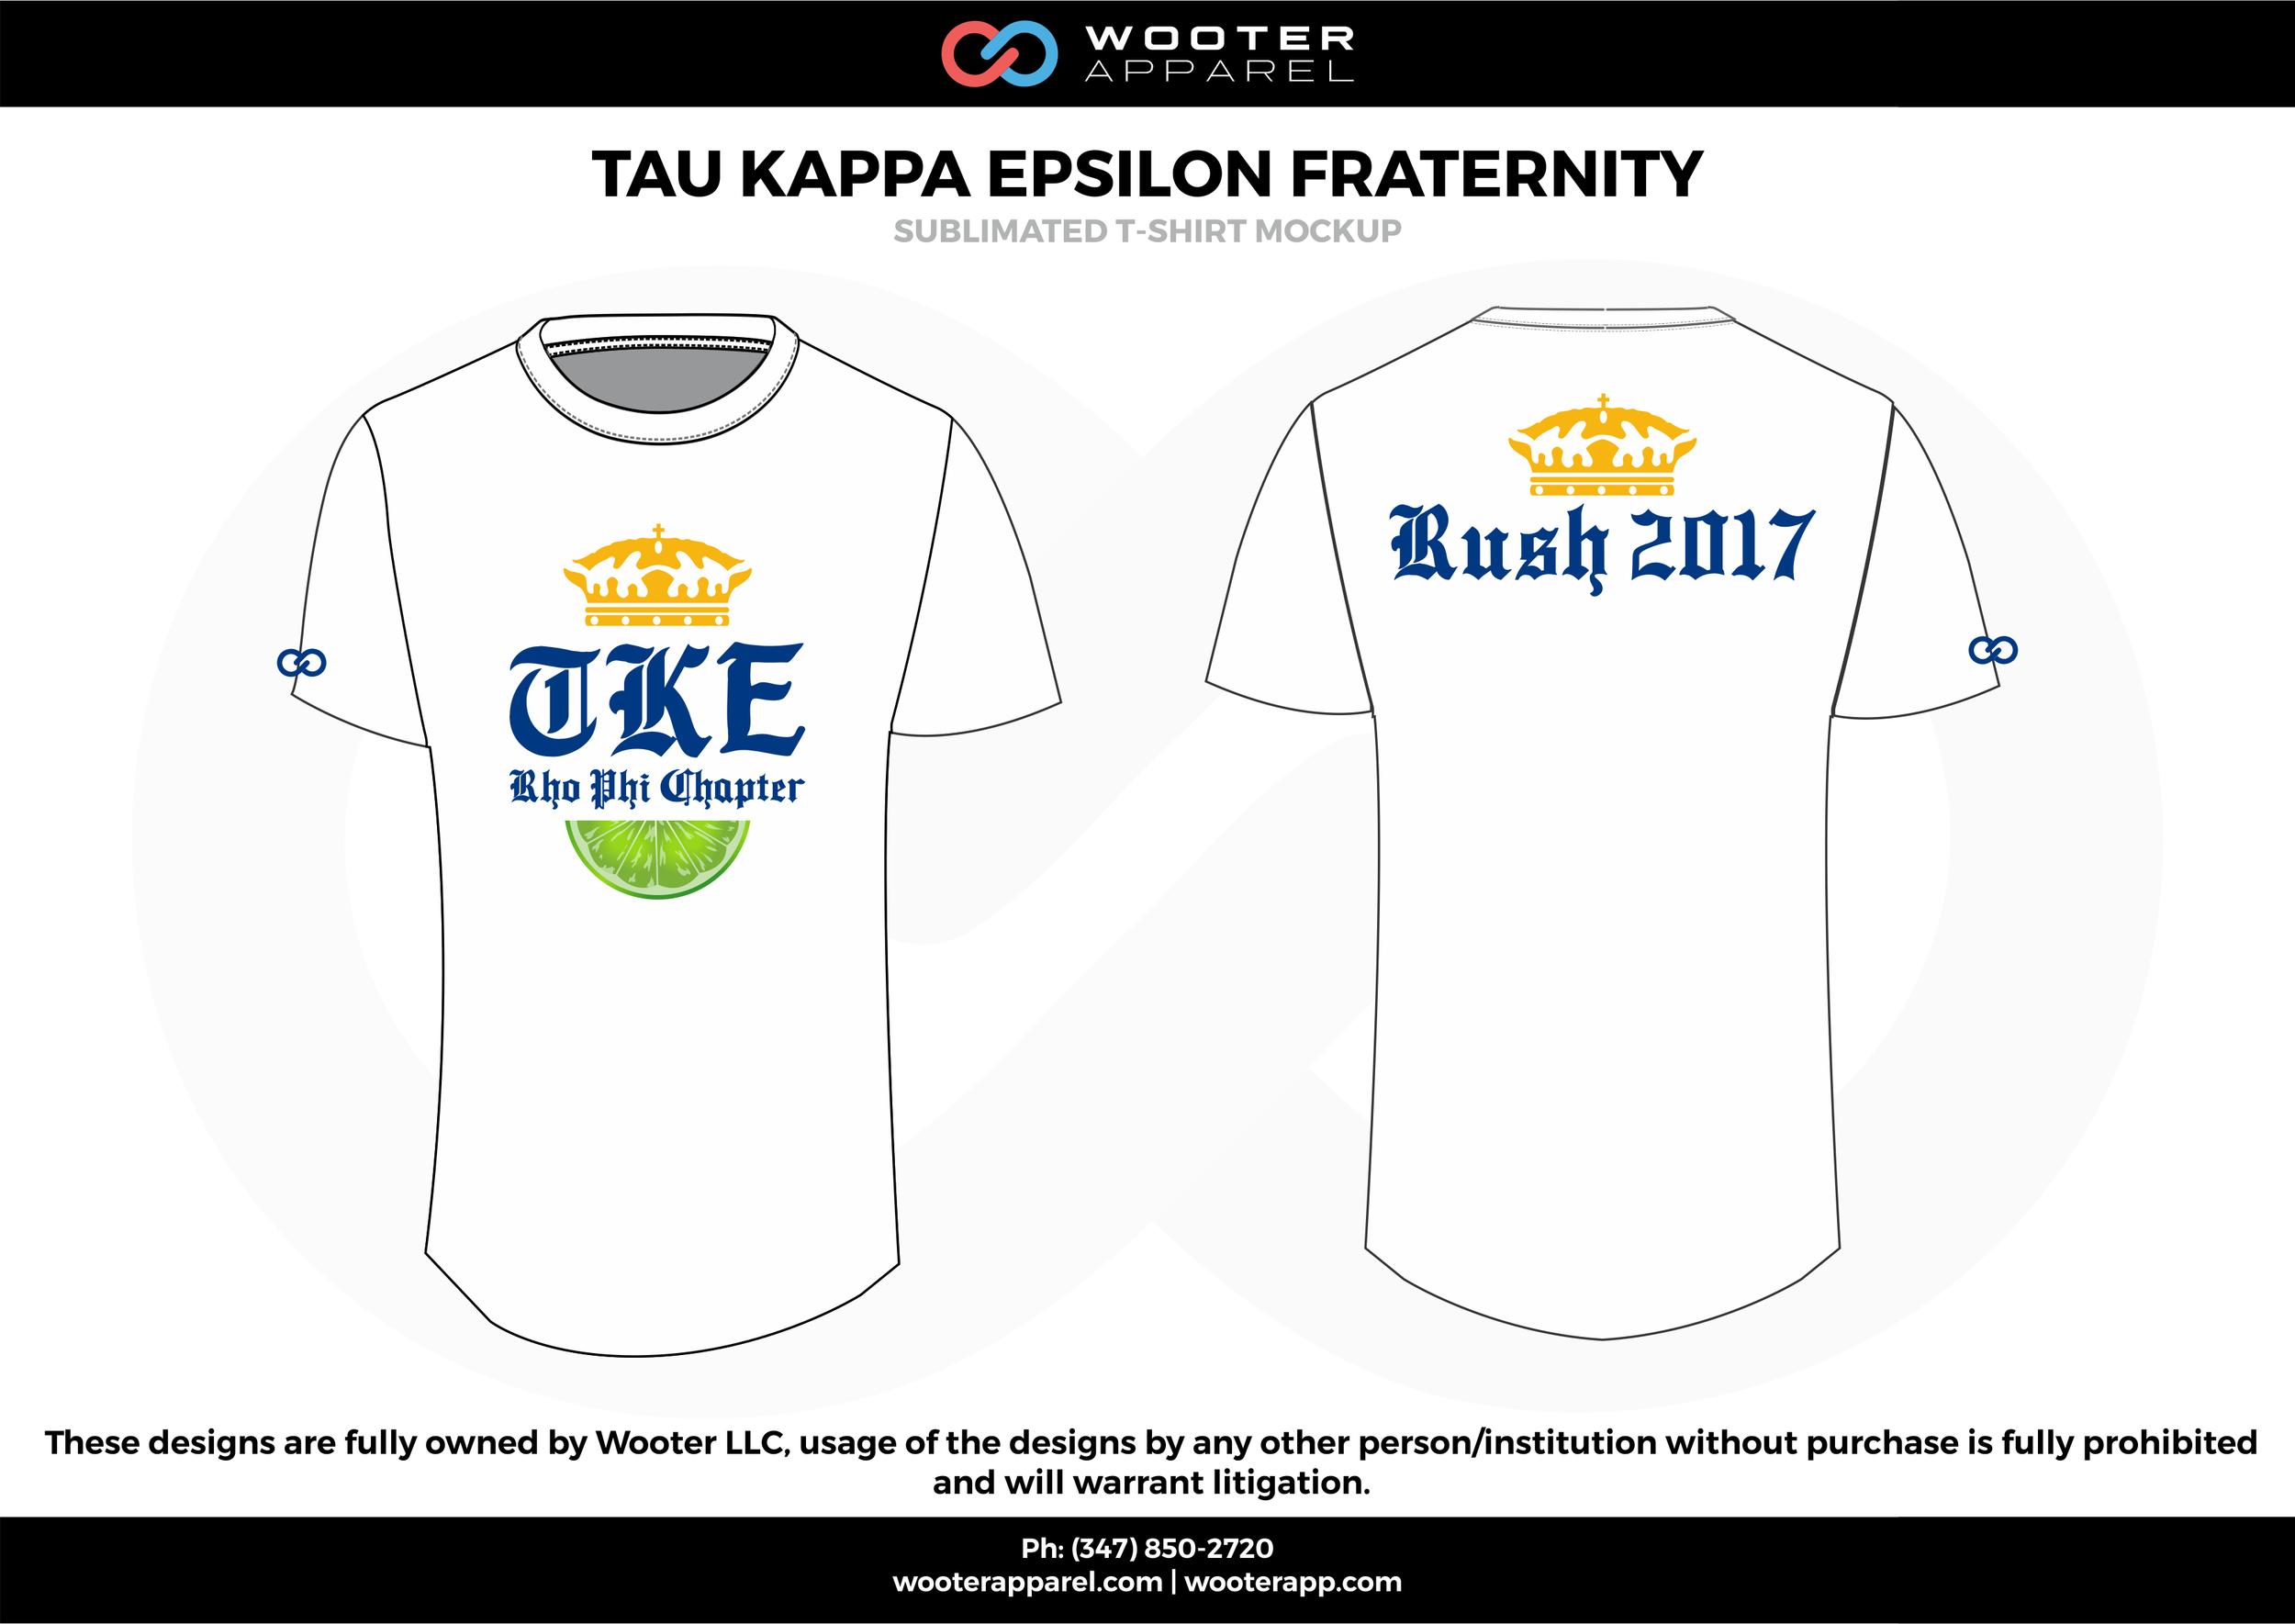 TAU KAPPA EPSILON FRATERNITY white blue yellow green sublimated uniforms t-shirts